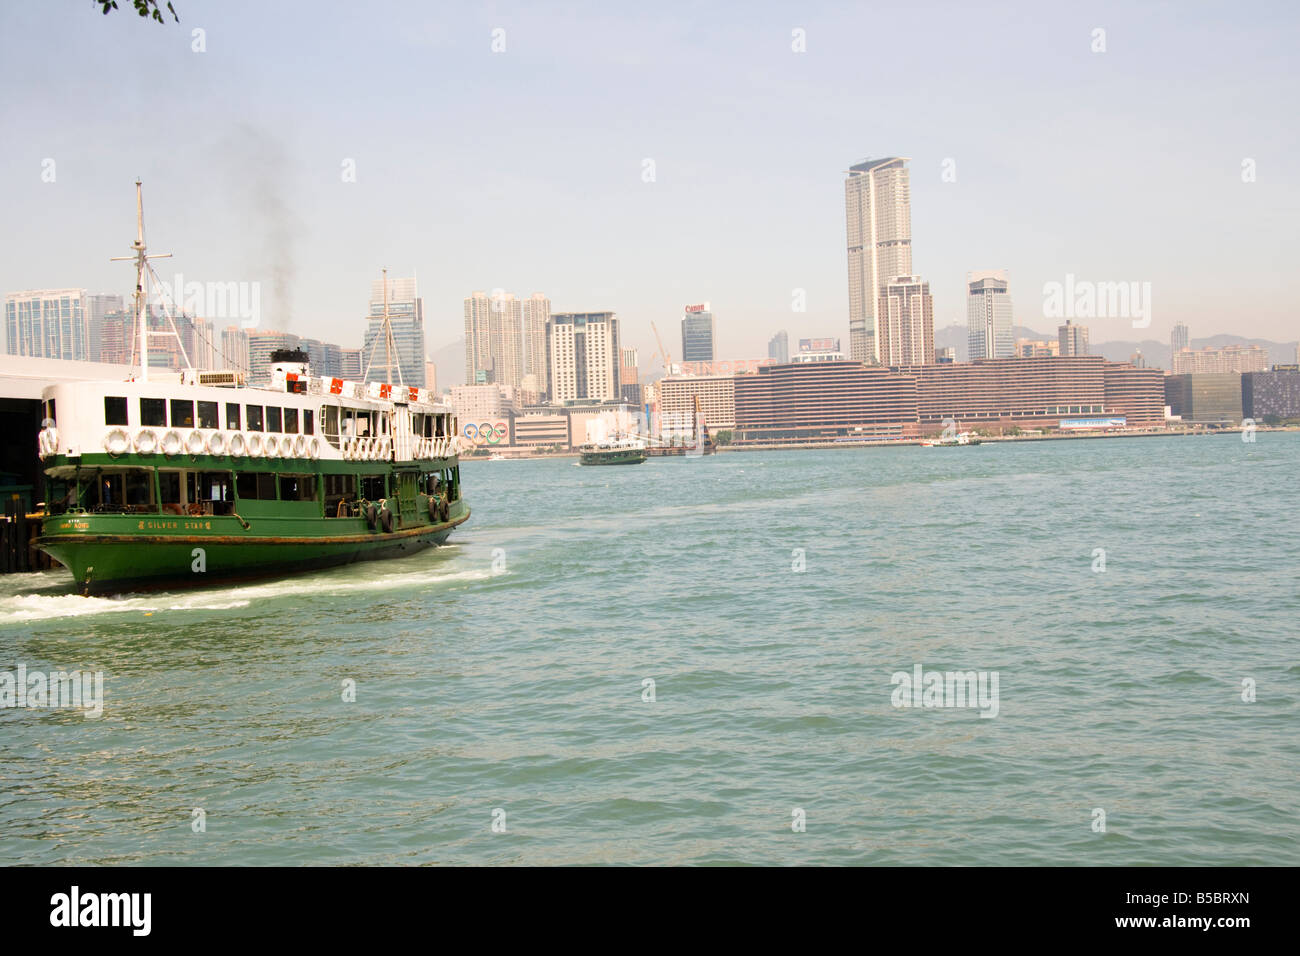 The star ferry leaves Hong Kong island and heads to Tsim Sha Tsui, Kowloon - Stock Image